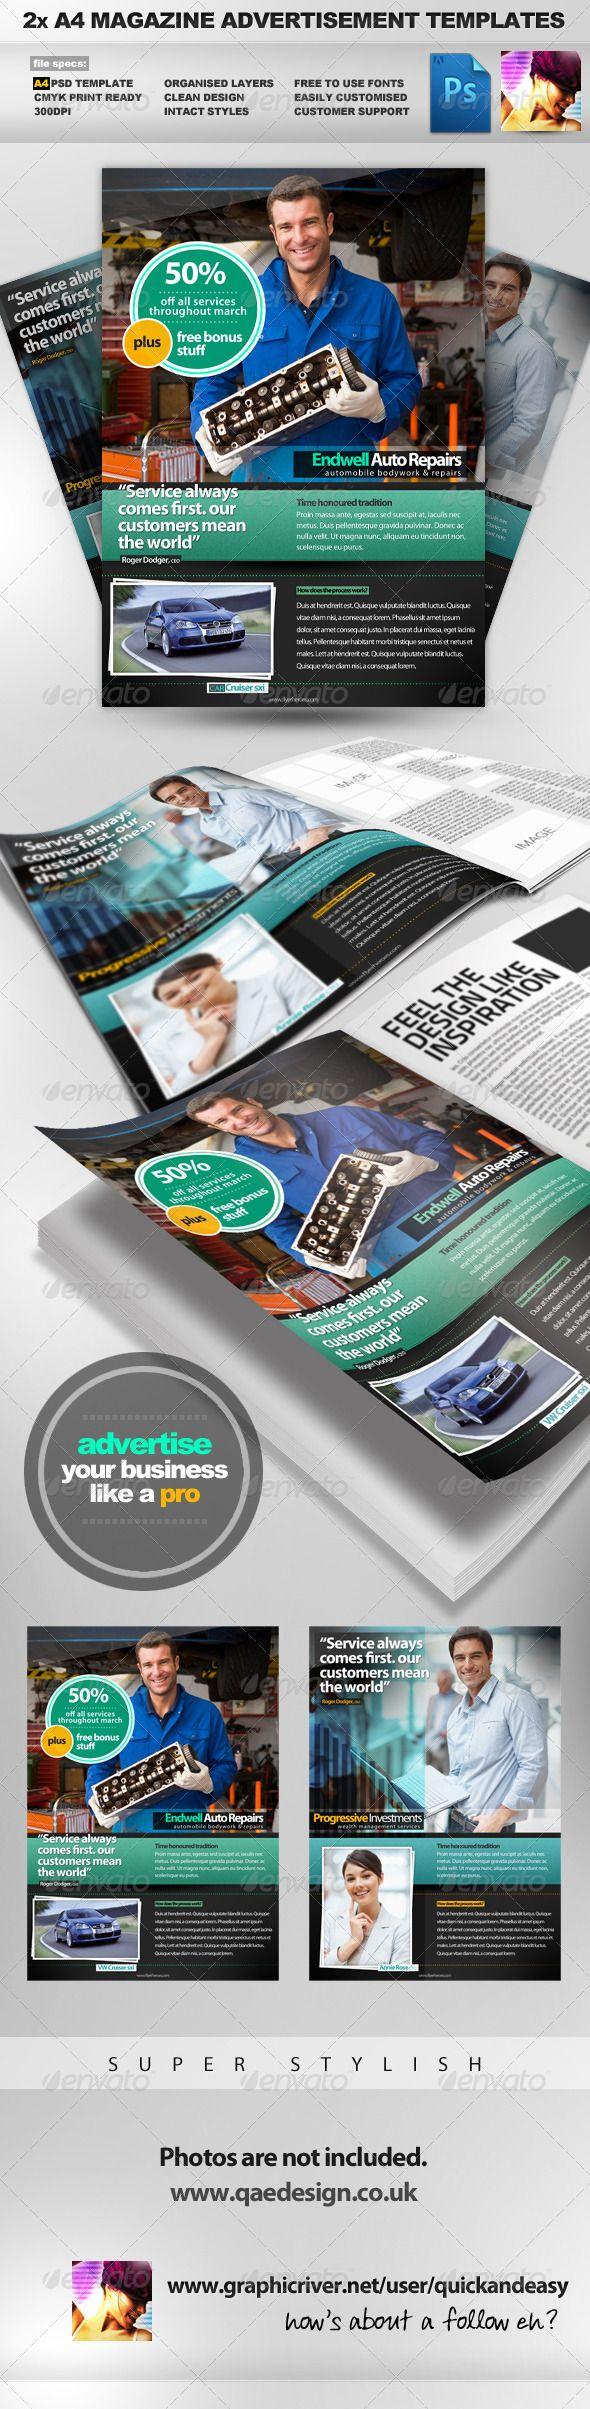 2x A4 PSD Magazine Advertisement Templates